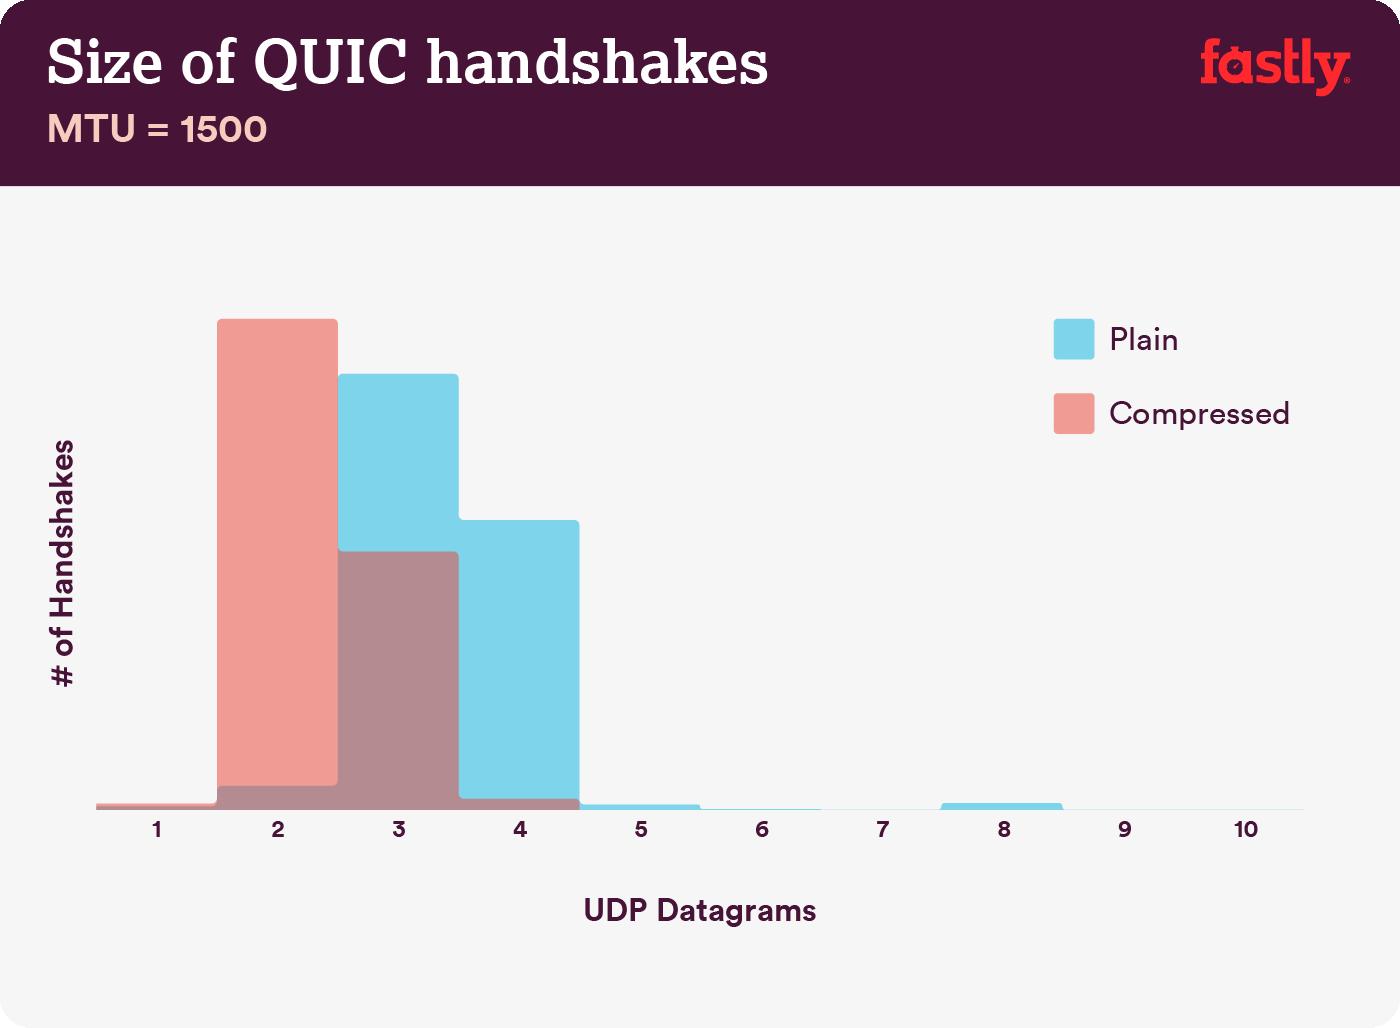 Size of QUIC handshakes 1500